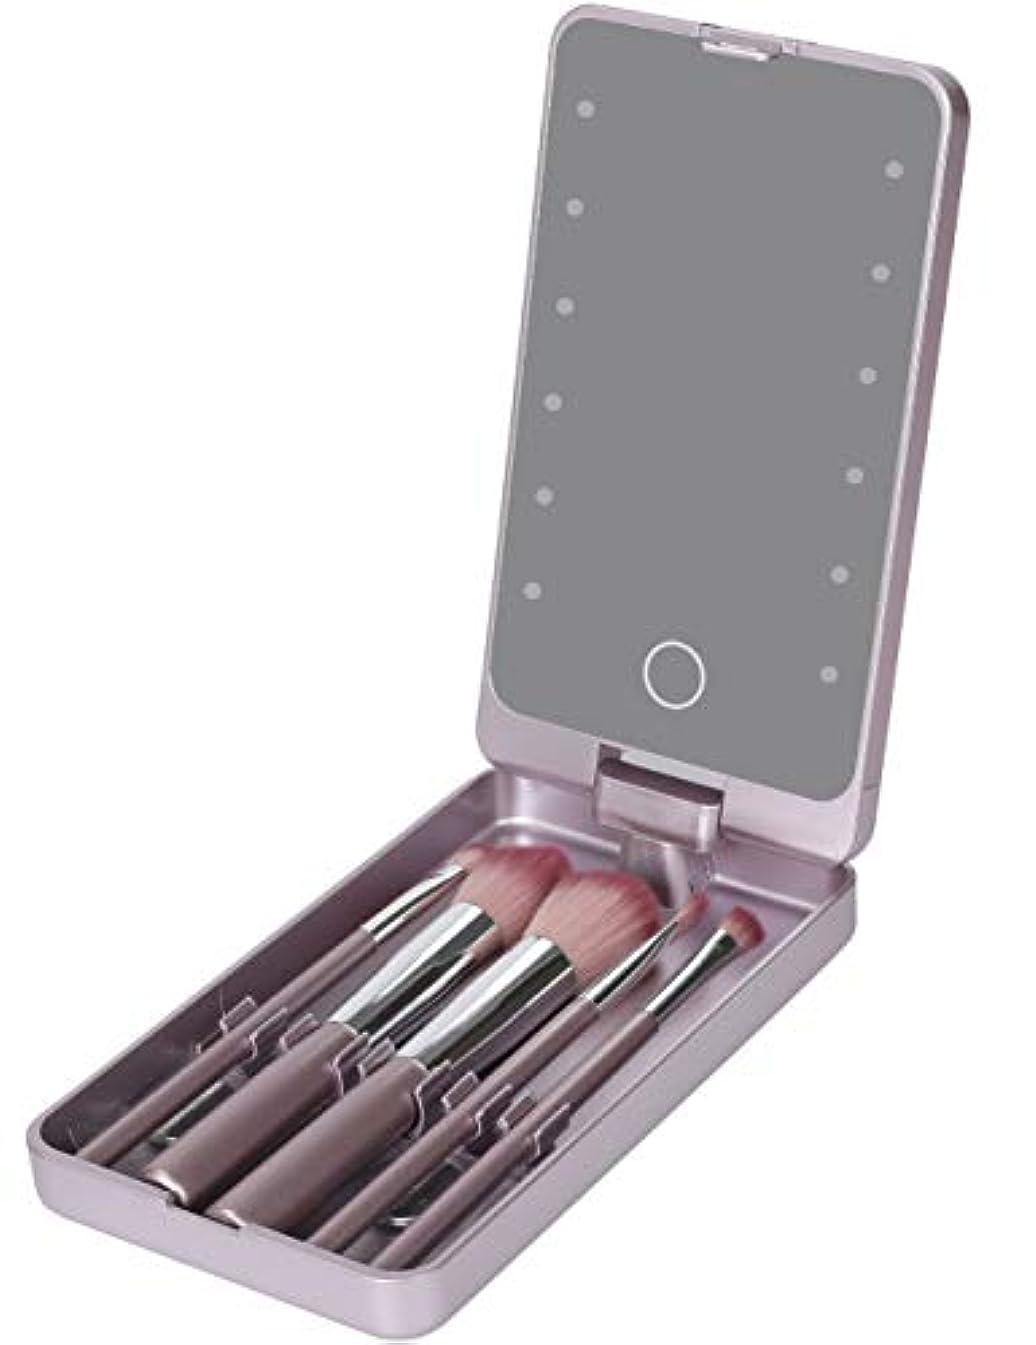 Looife 化粧鏡 led ミラー 5化粧ブラシ付き ライト付き女優ミラー 携帯型 (紫の)